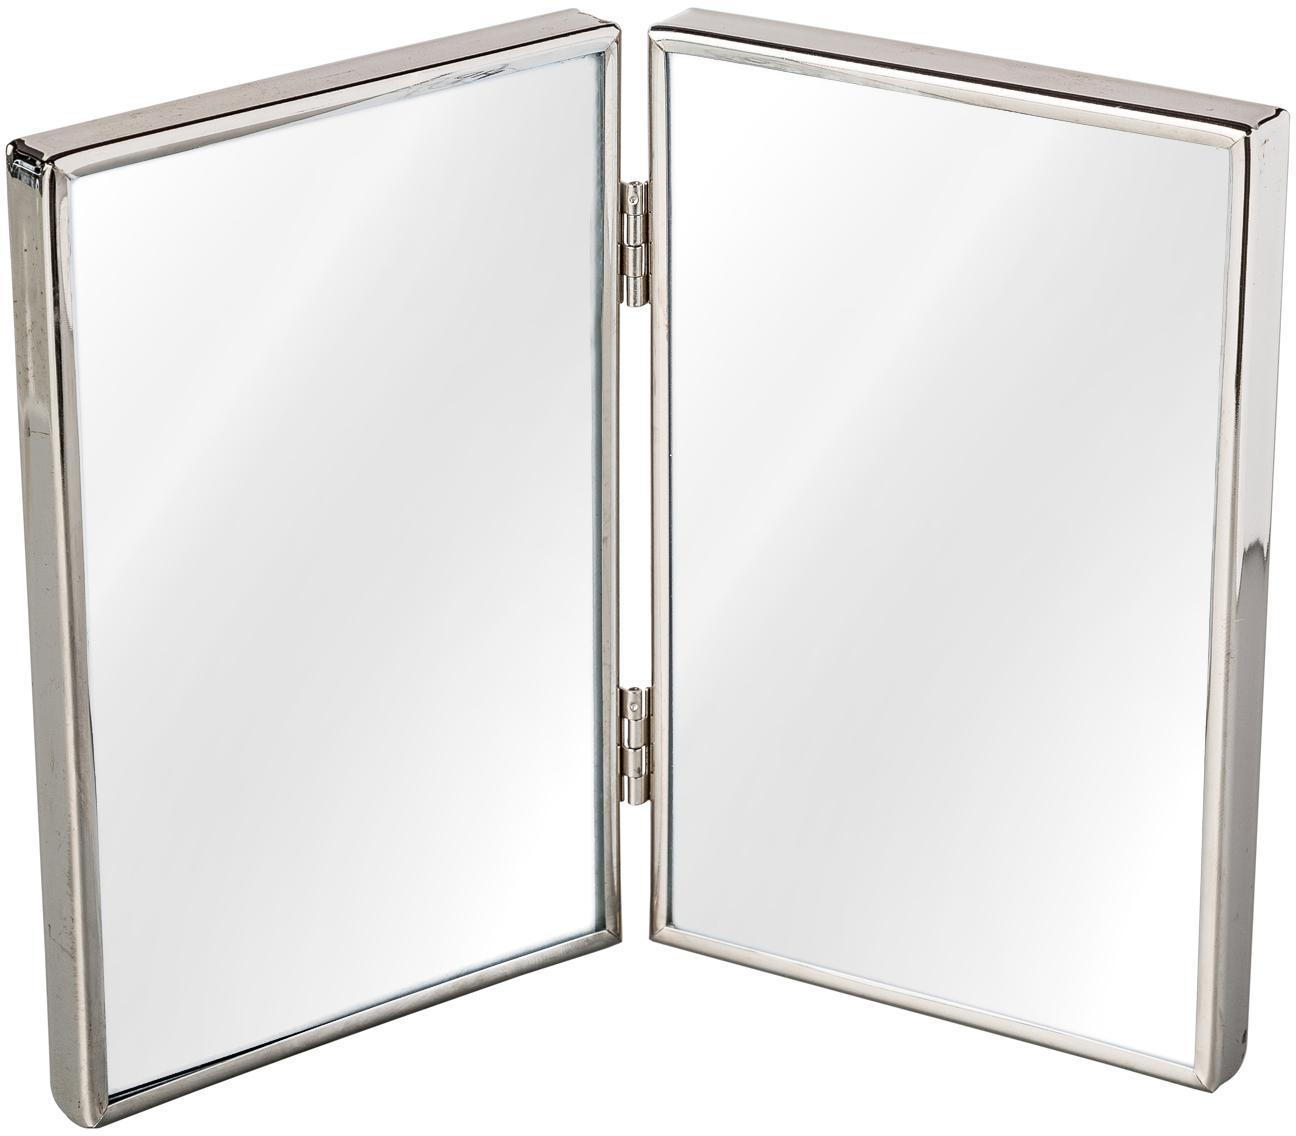 Portafoto multiplo in metallo Twinny, Metallo, vetro, Argento, 10 x 15 cm